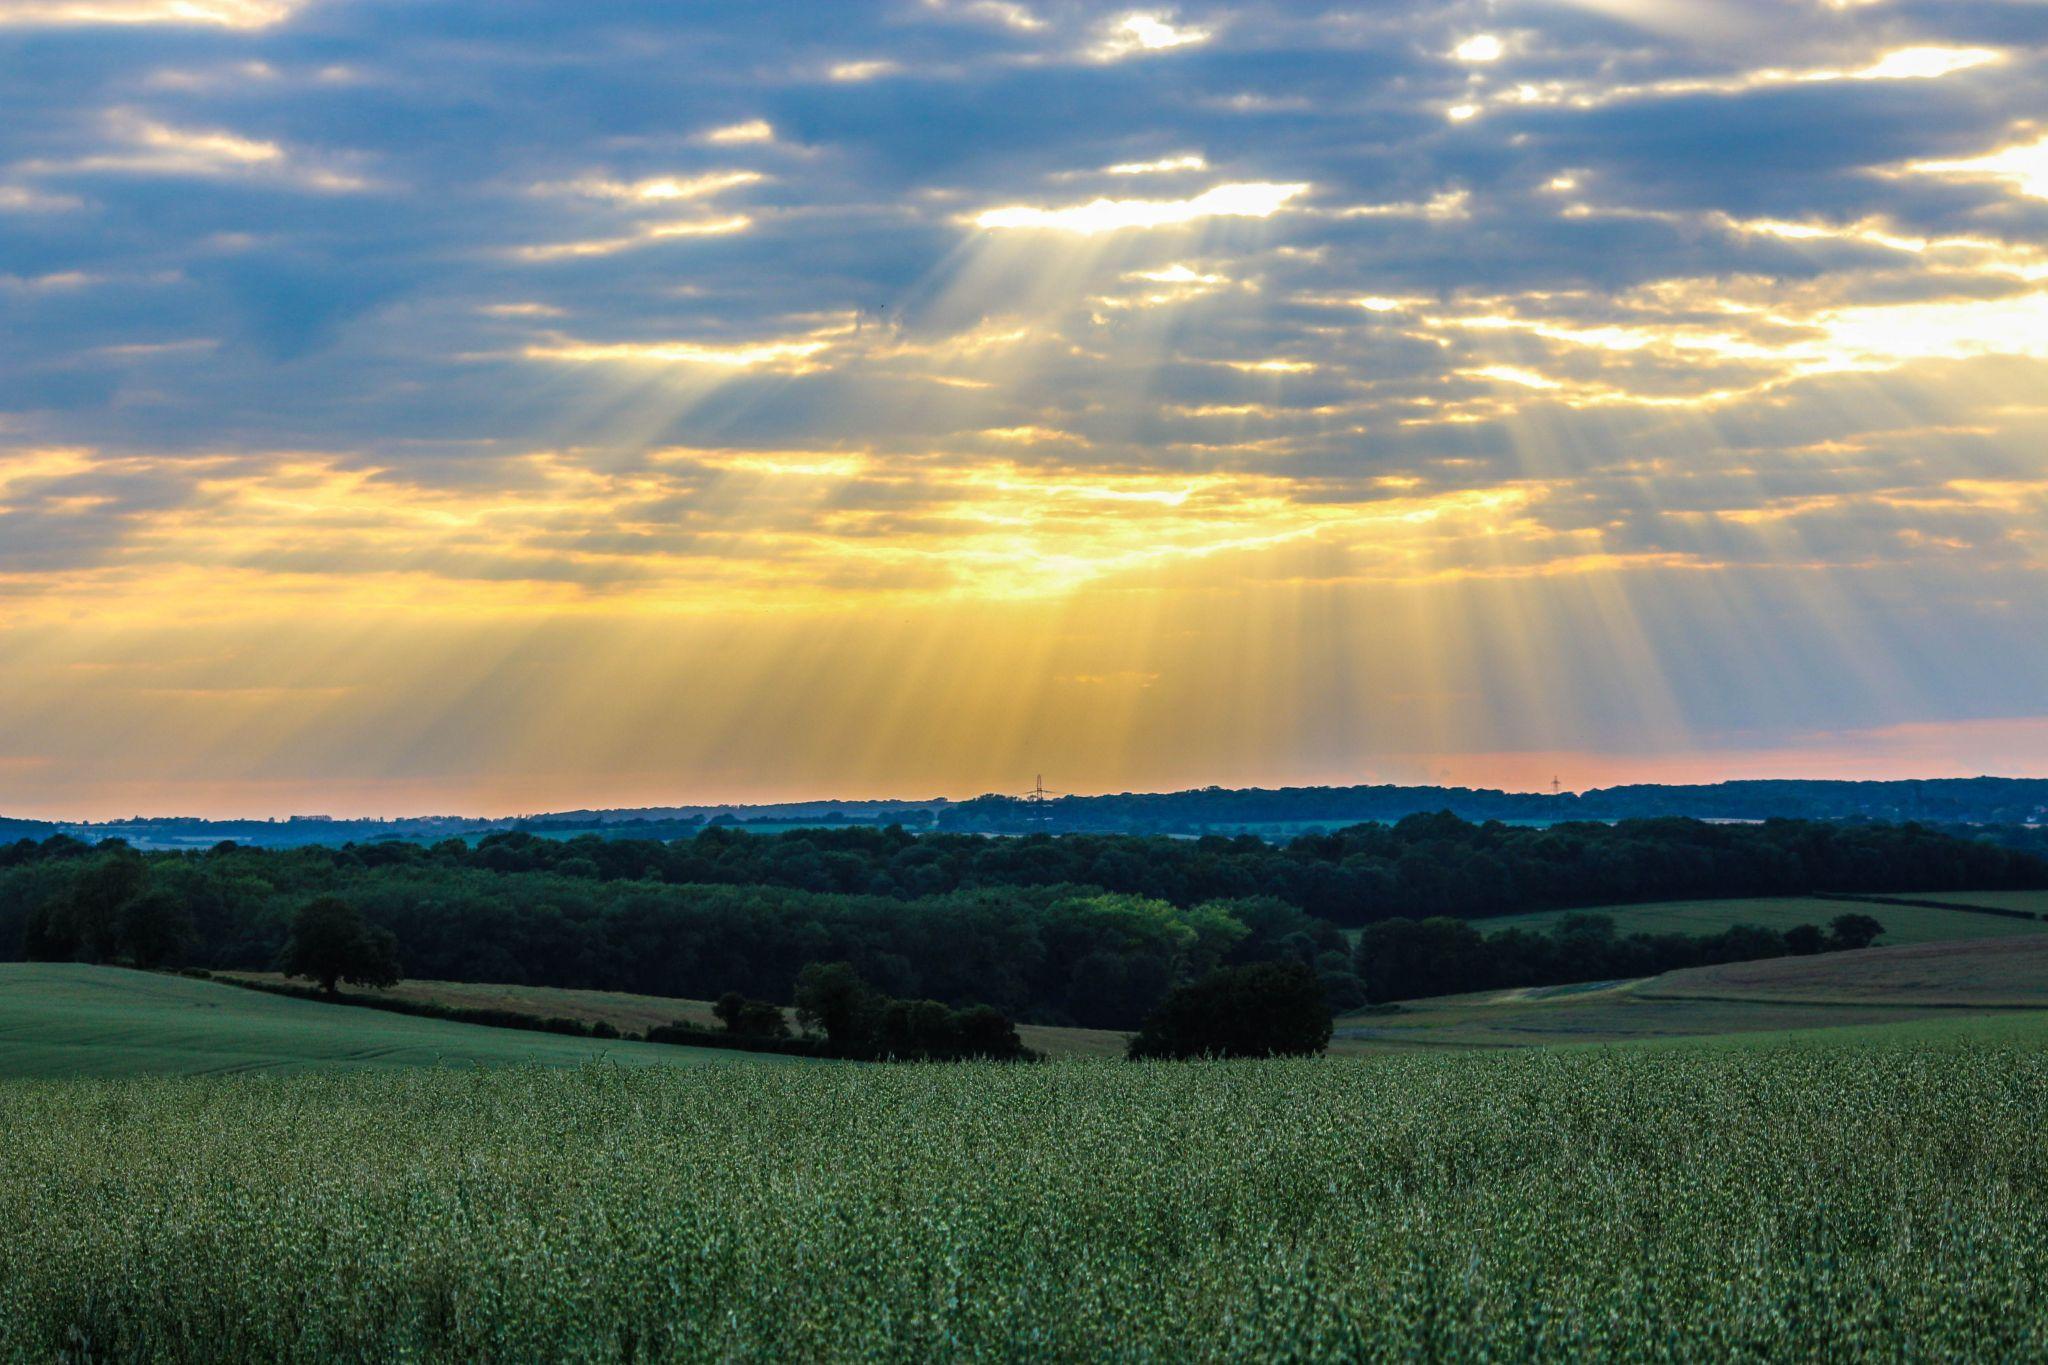 Sunset over Field, United Kingdom